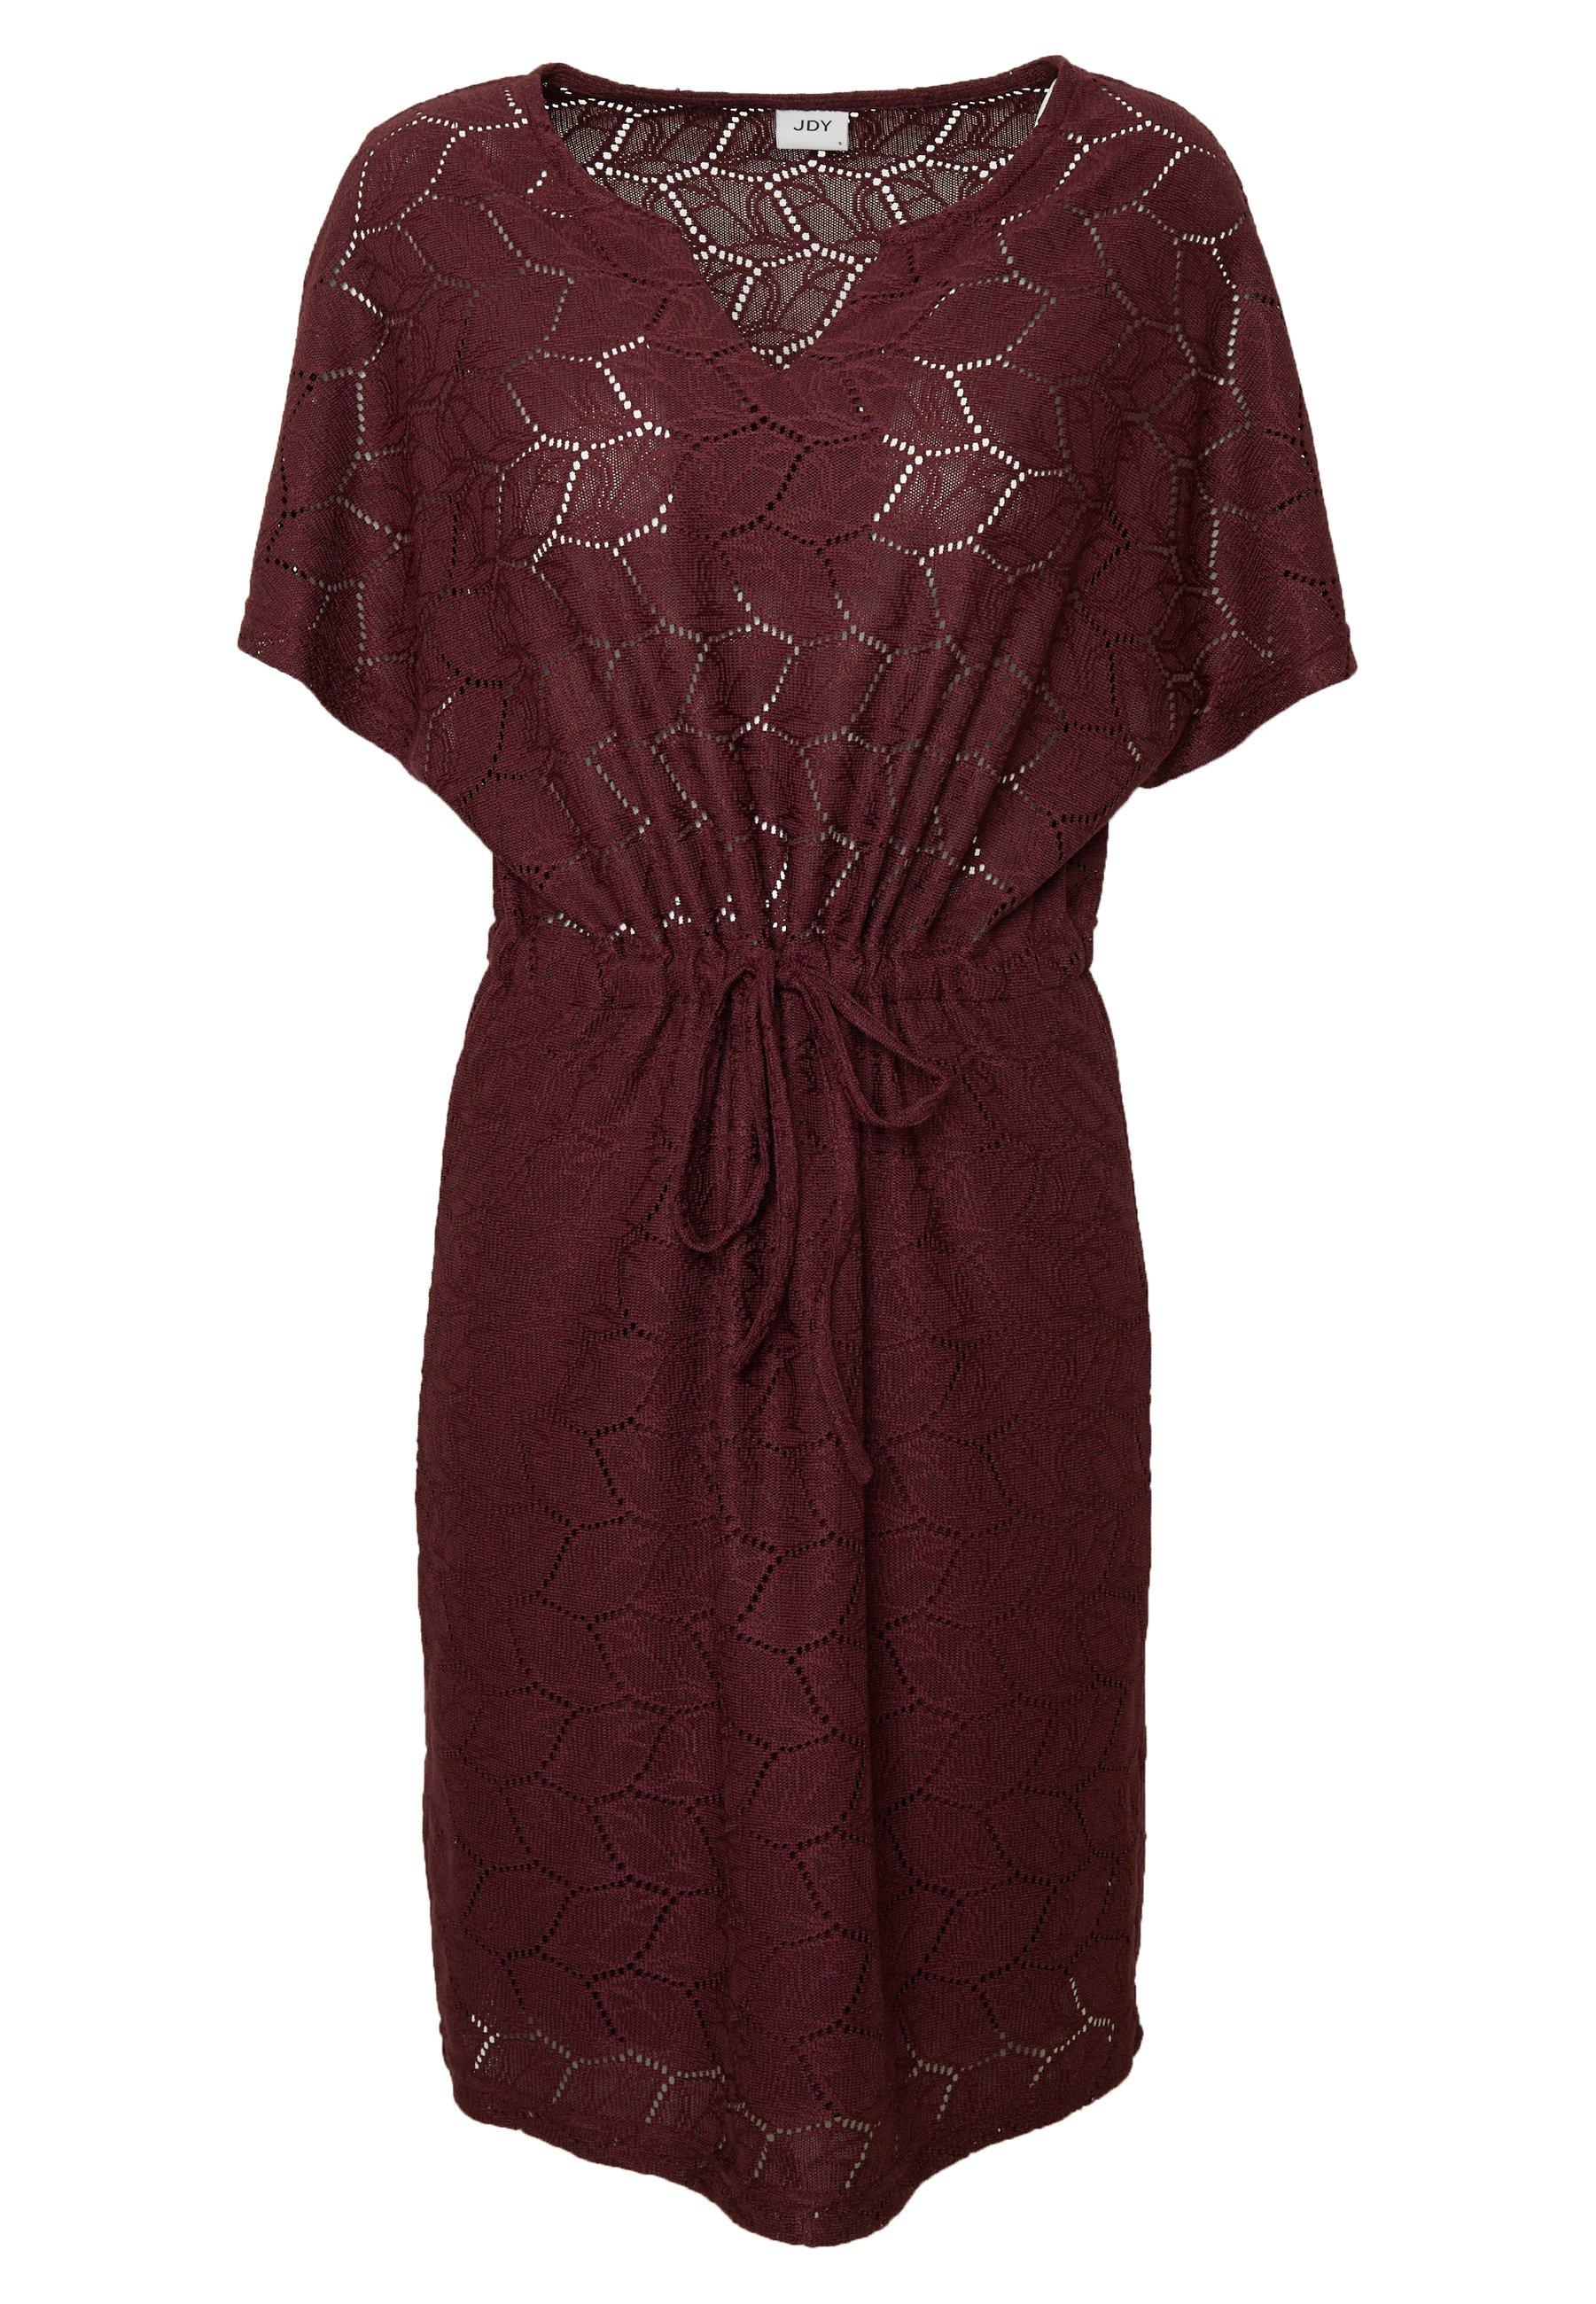 Jdy Jdytag Belt Dress - Robe Pull Port Royale